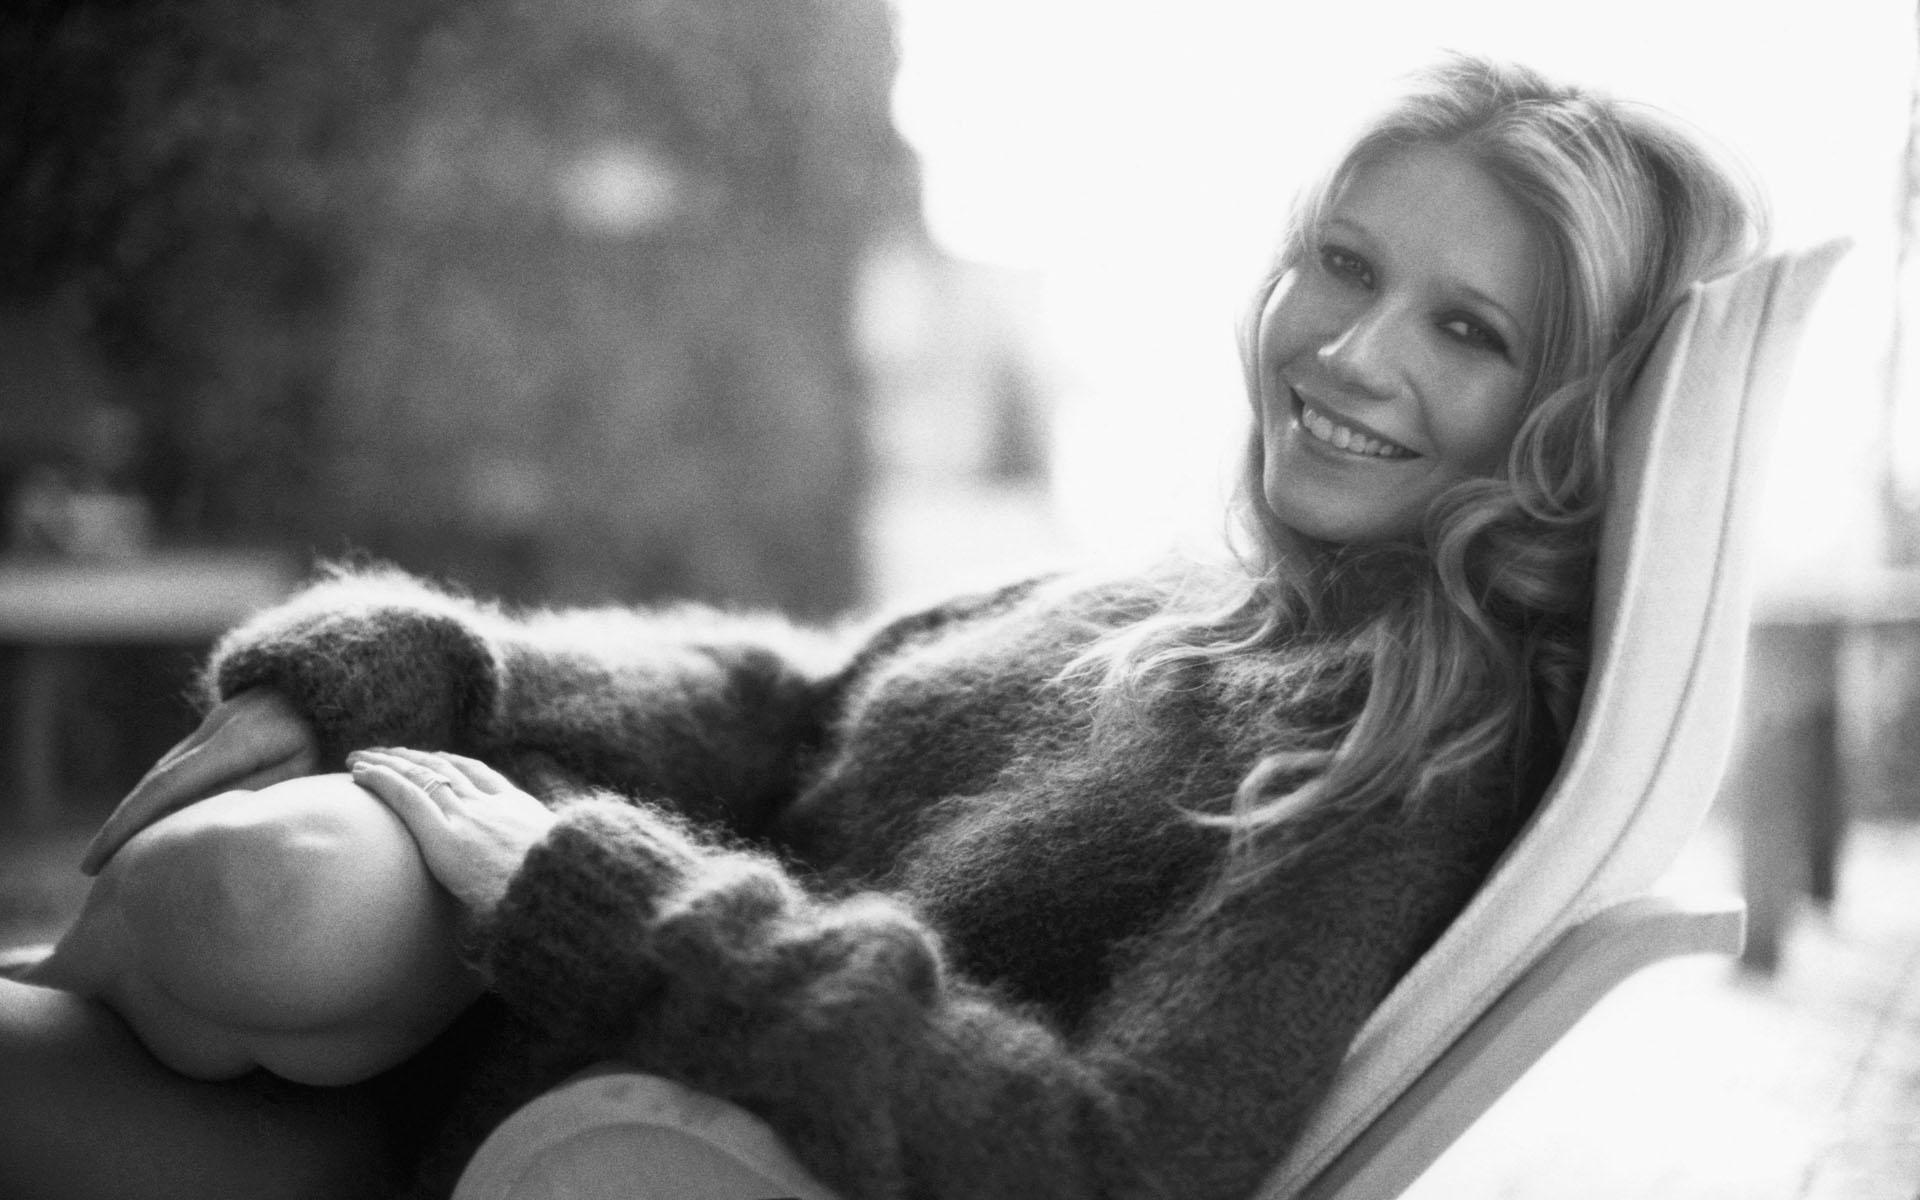 Beautiful Gwyneth Paltrow Wallpaper 6884312 1920x1200